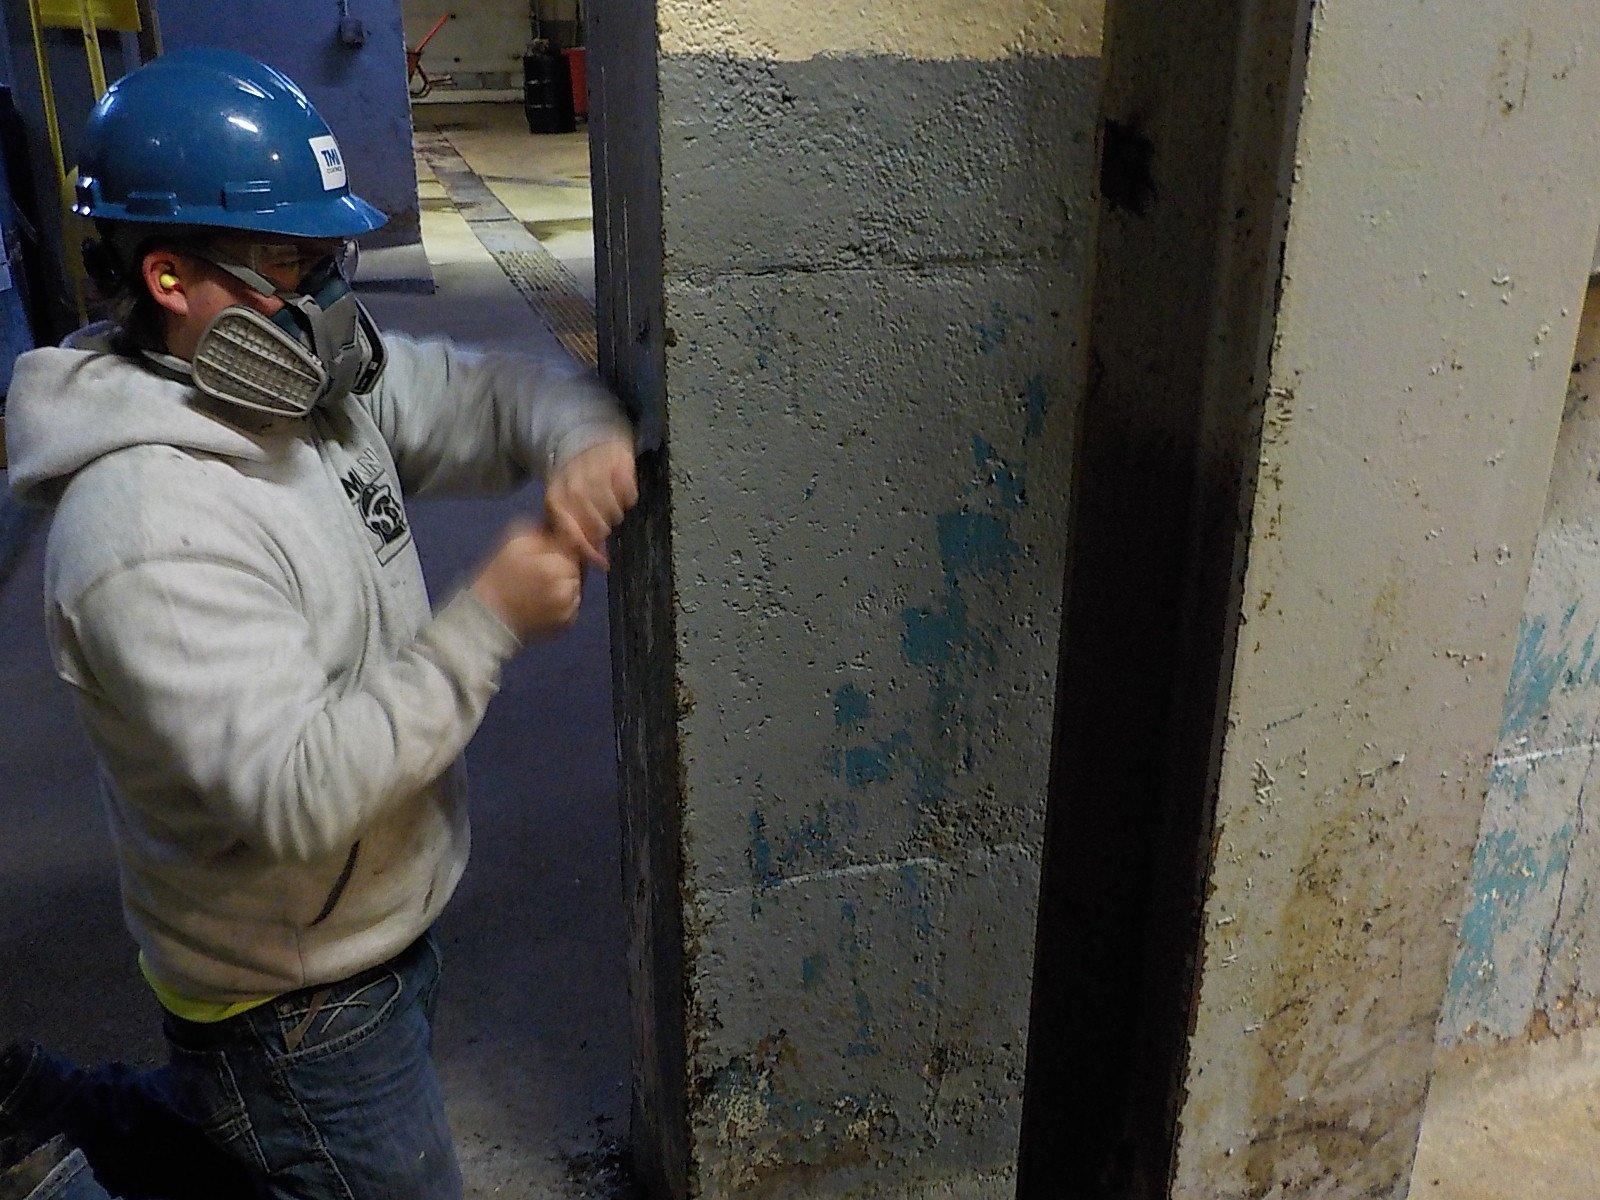 TMI MAN hard at work preparing the walls for FIBERLIFE coating